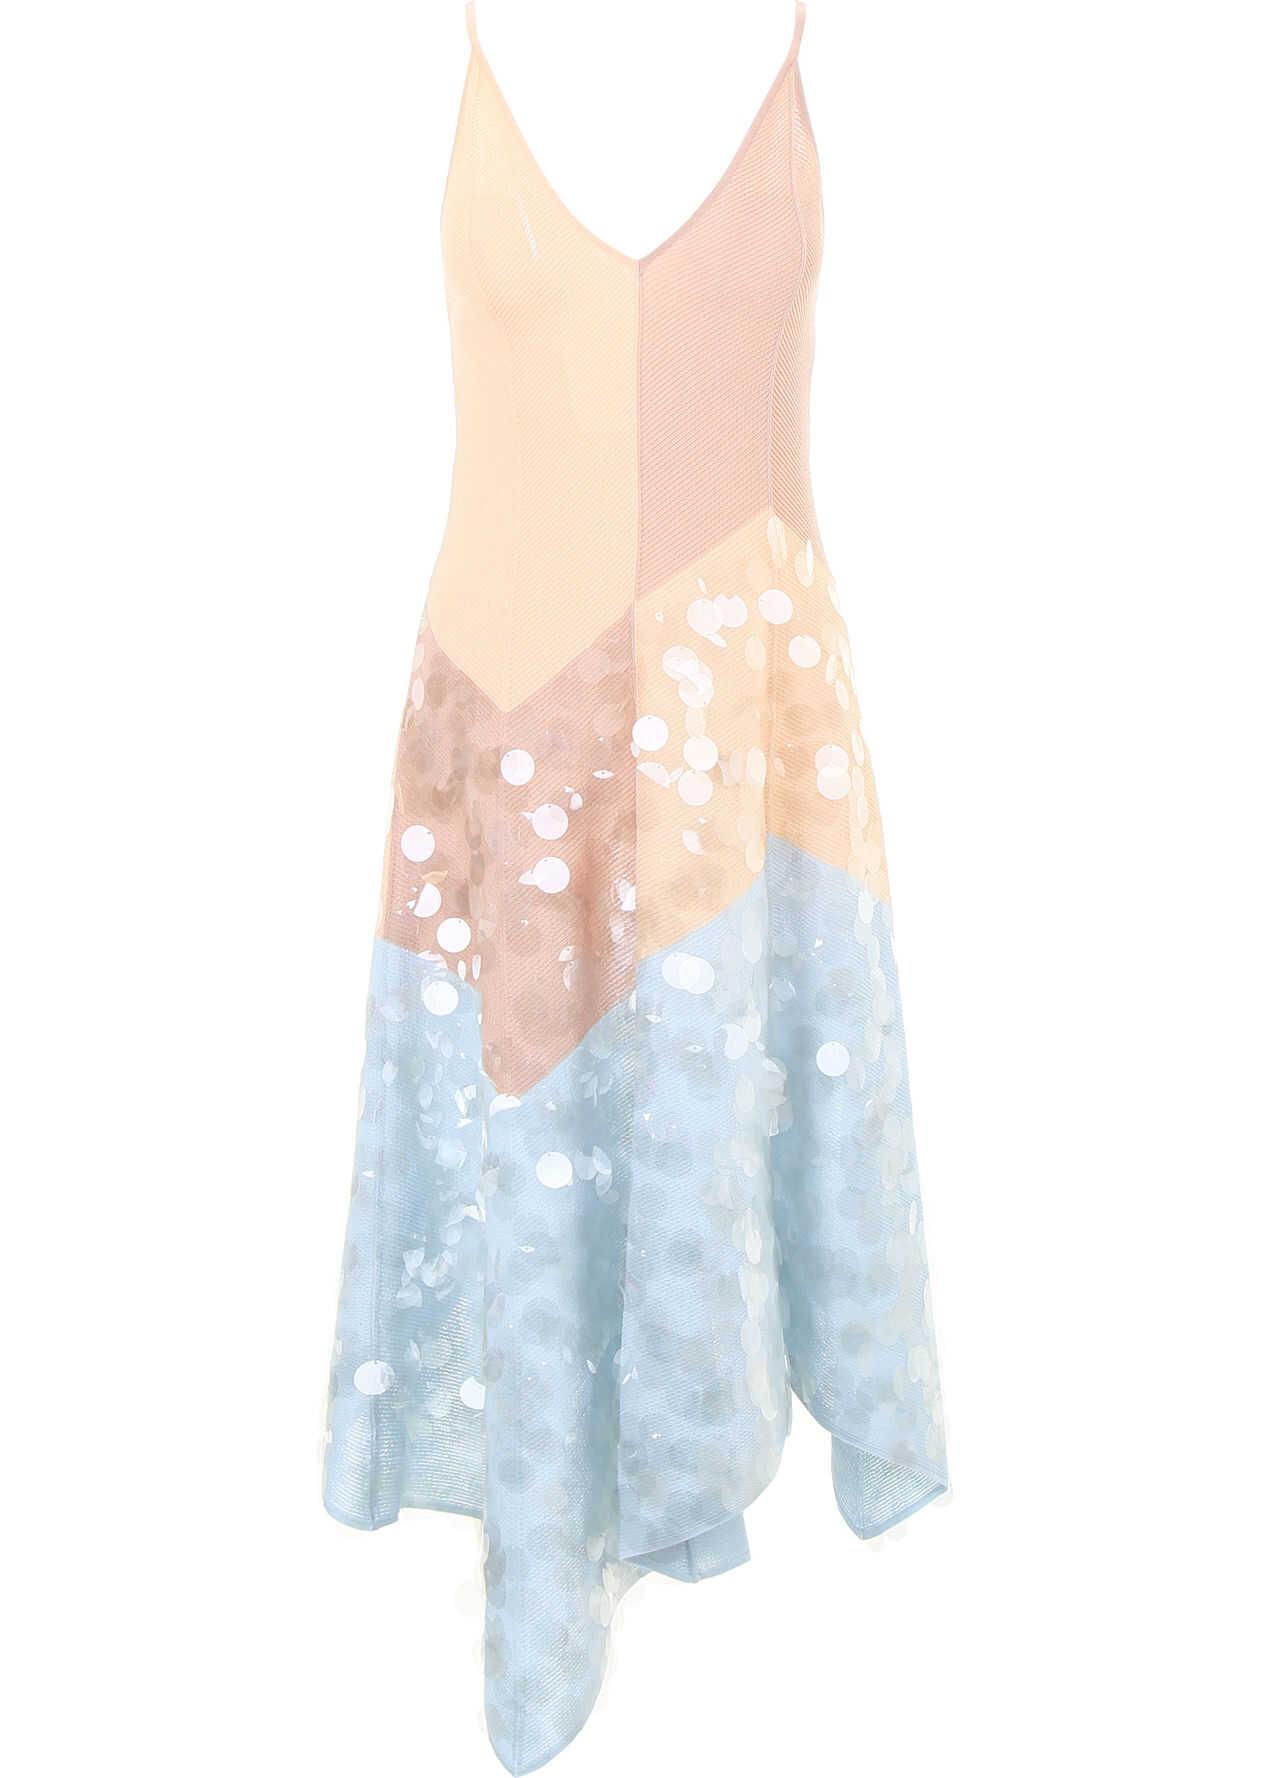 Bottega Veneta Knit Dress With Sequins ARTIC CAMEL PEACH ROSE